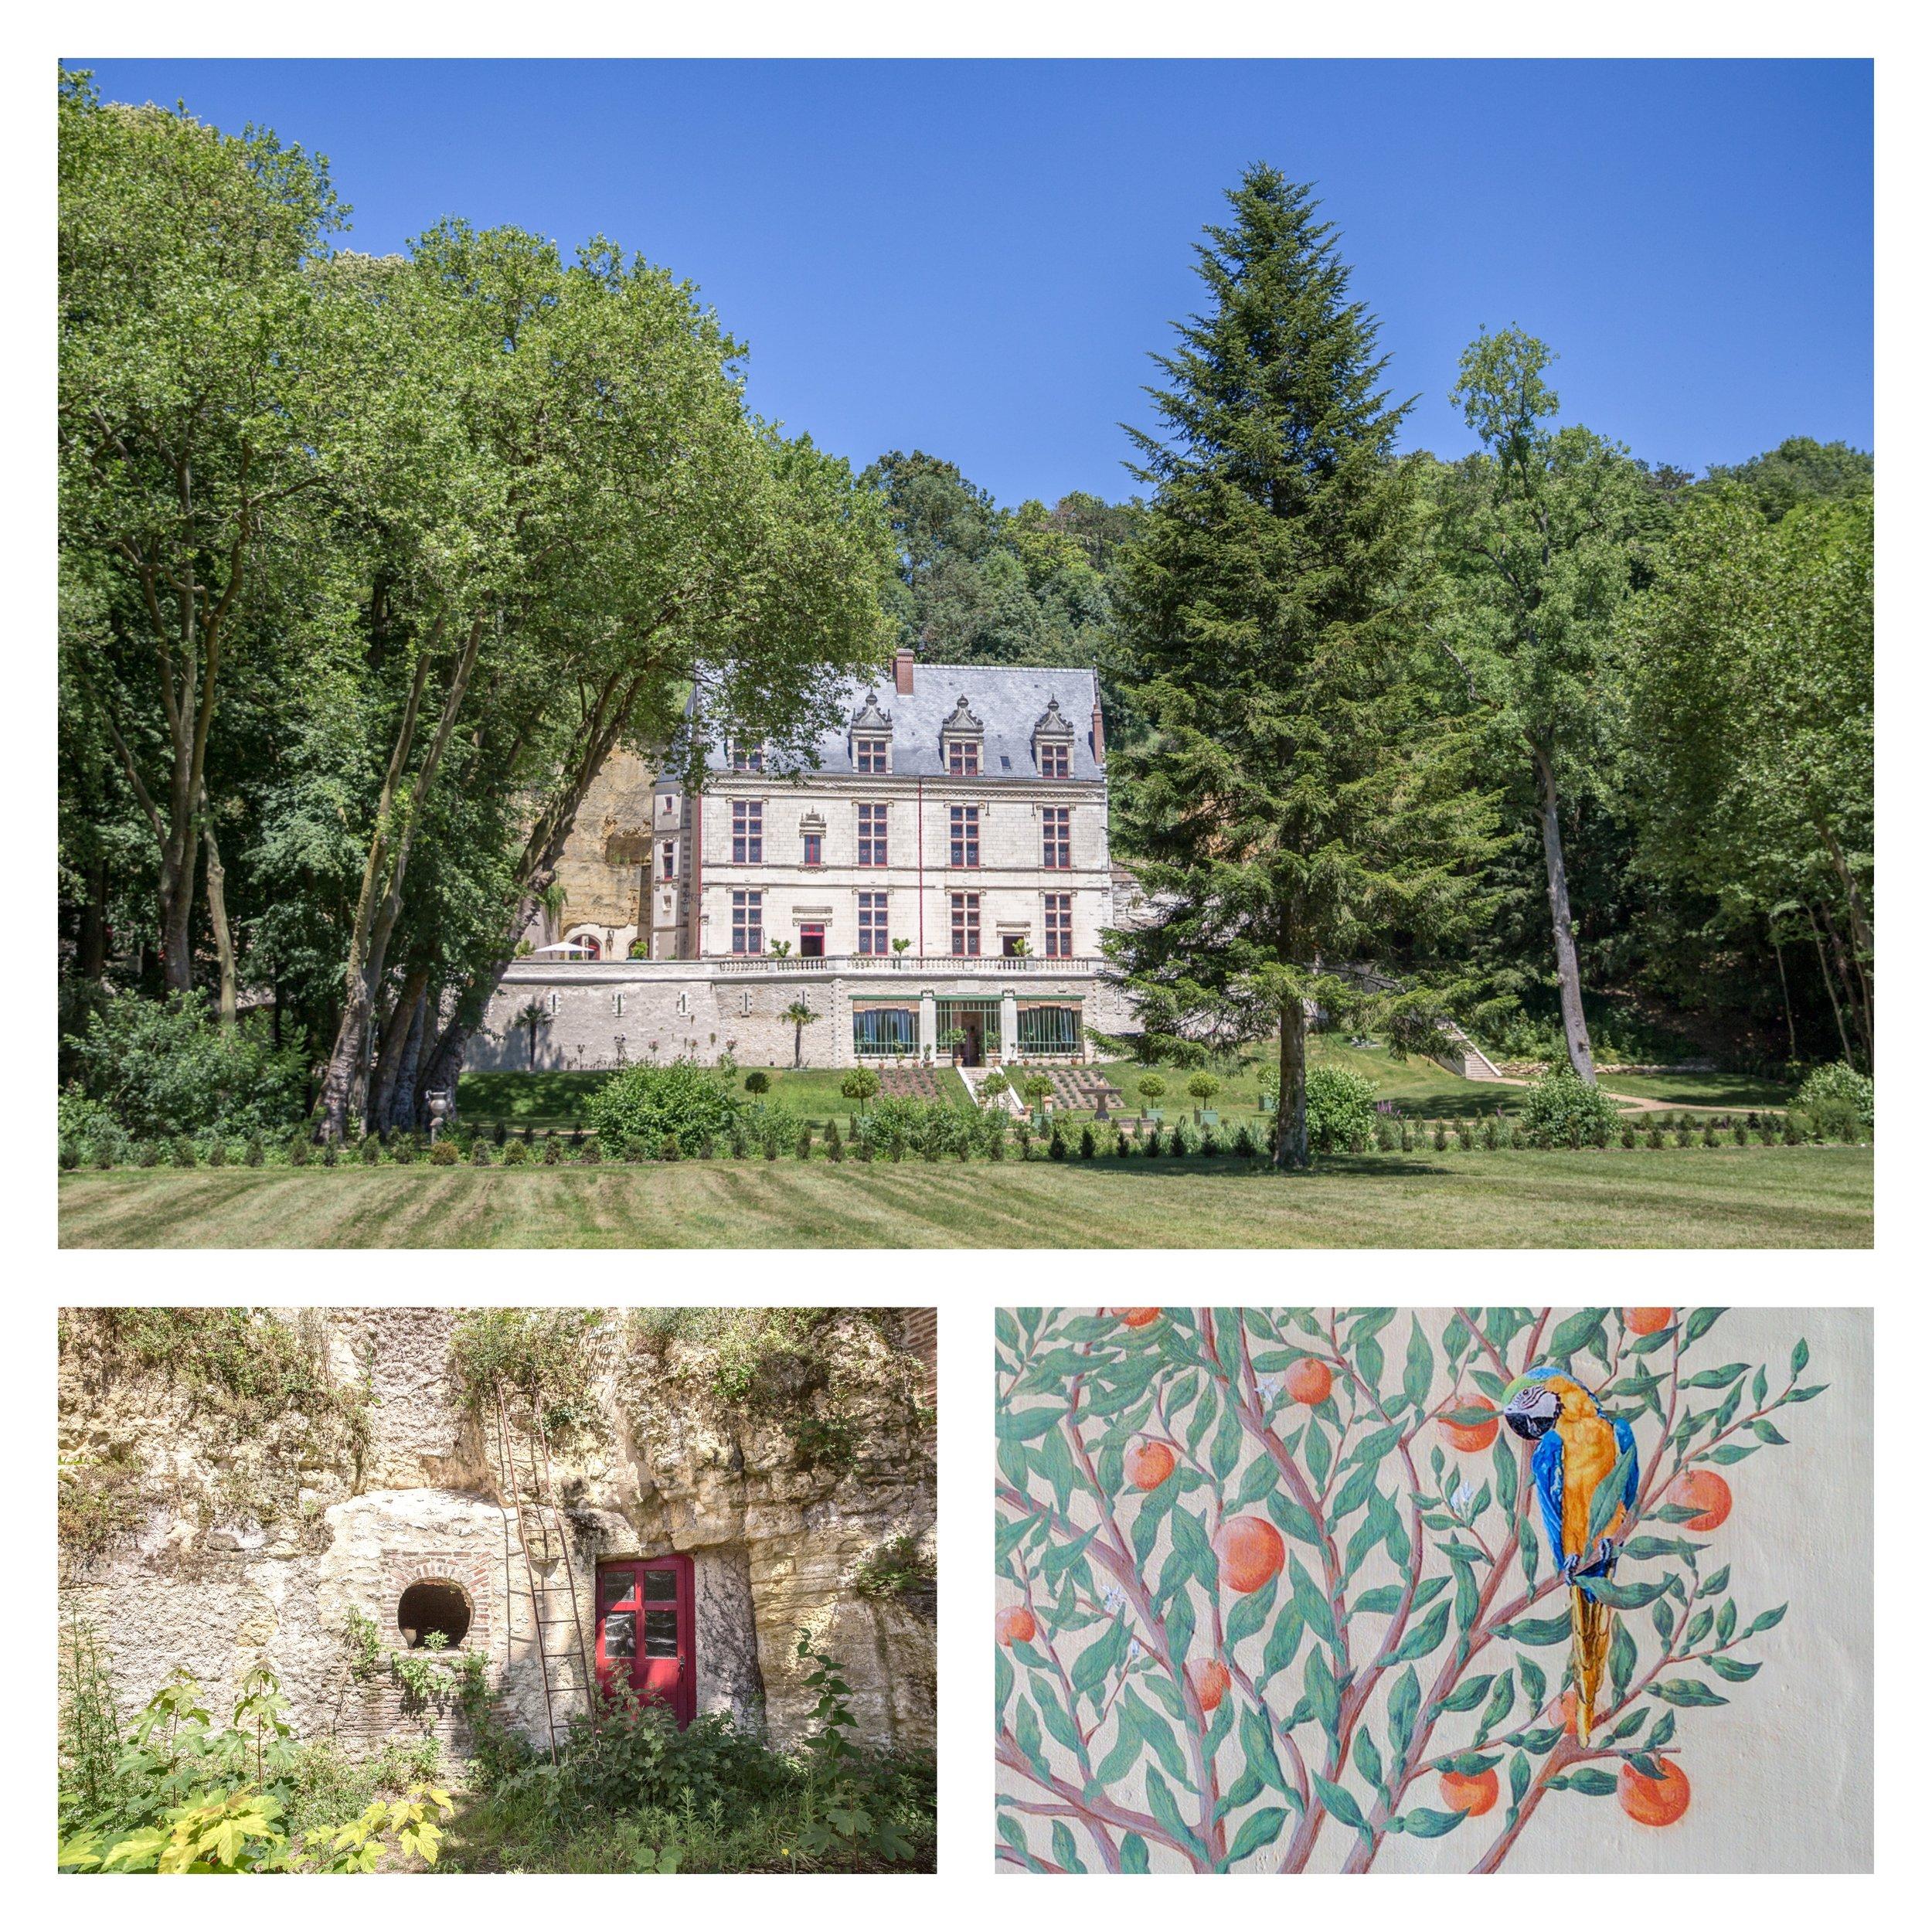 Day 4 - Château Gaillard - Day Visit to Château Gaillard.The forgotten Royal Paradise.